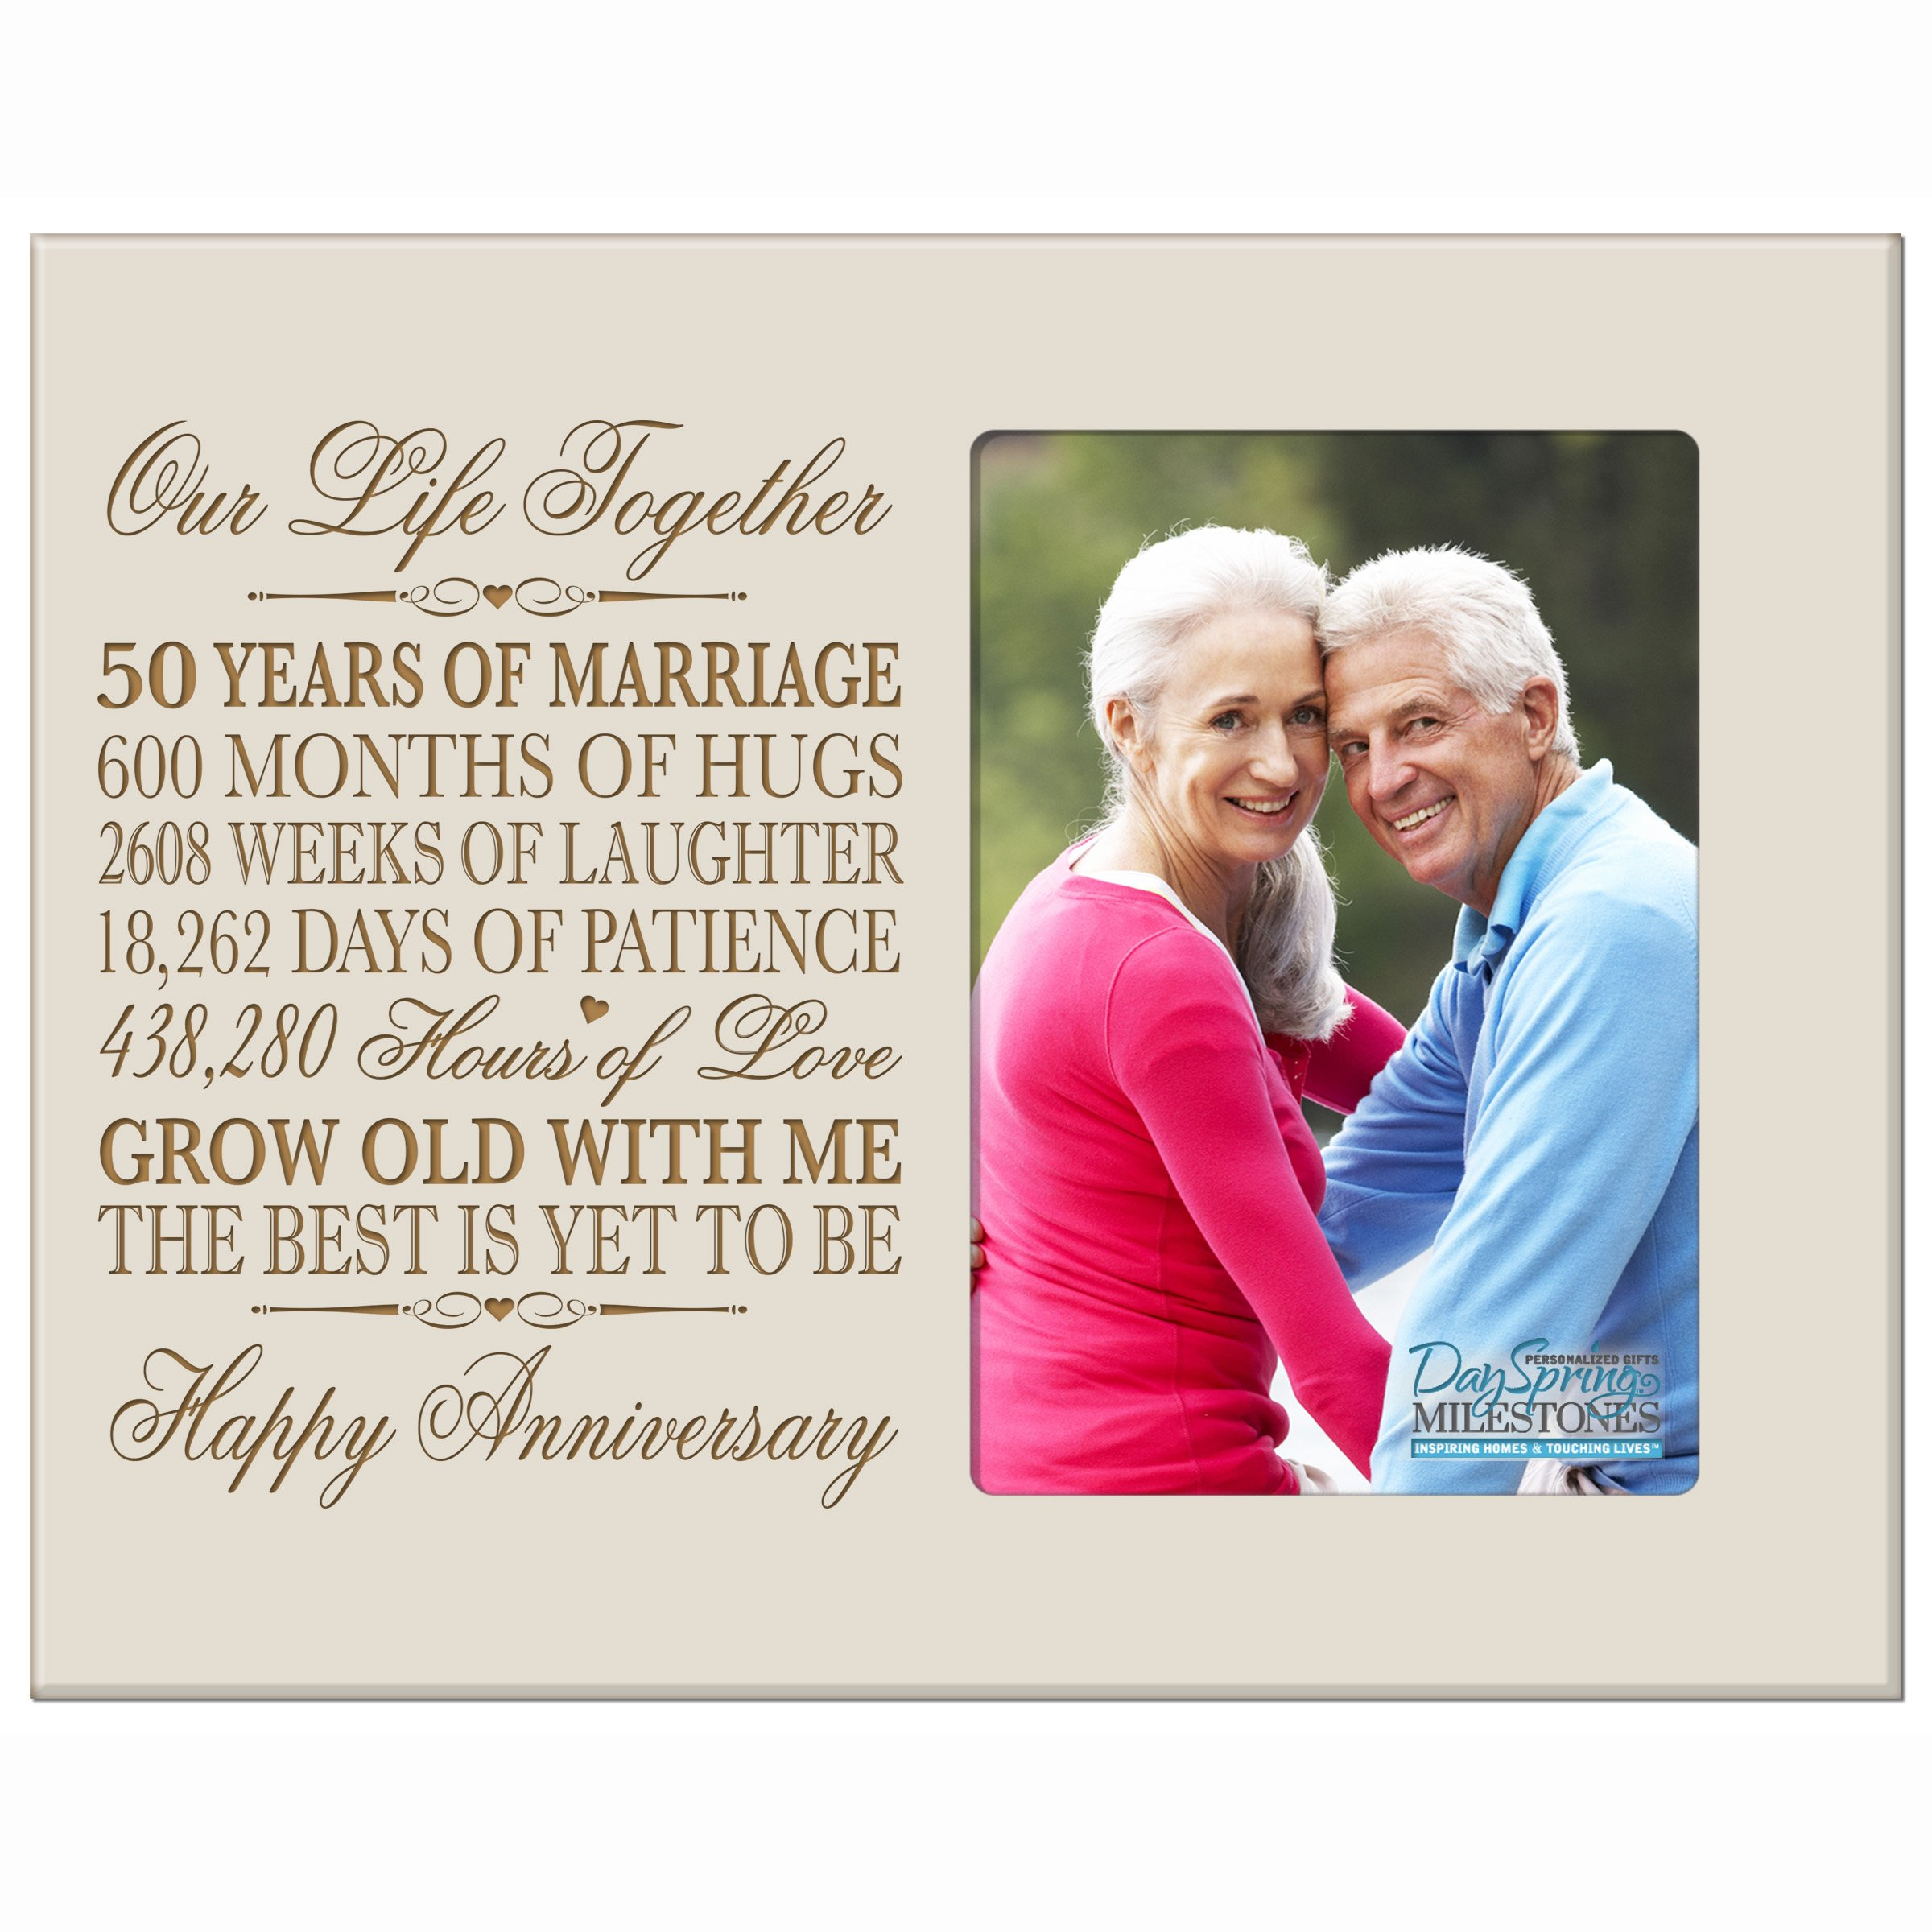 Cheap Wedding Anniversary Gift Year Find Wedding Anniversary Gift